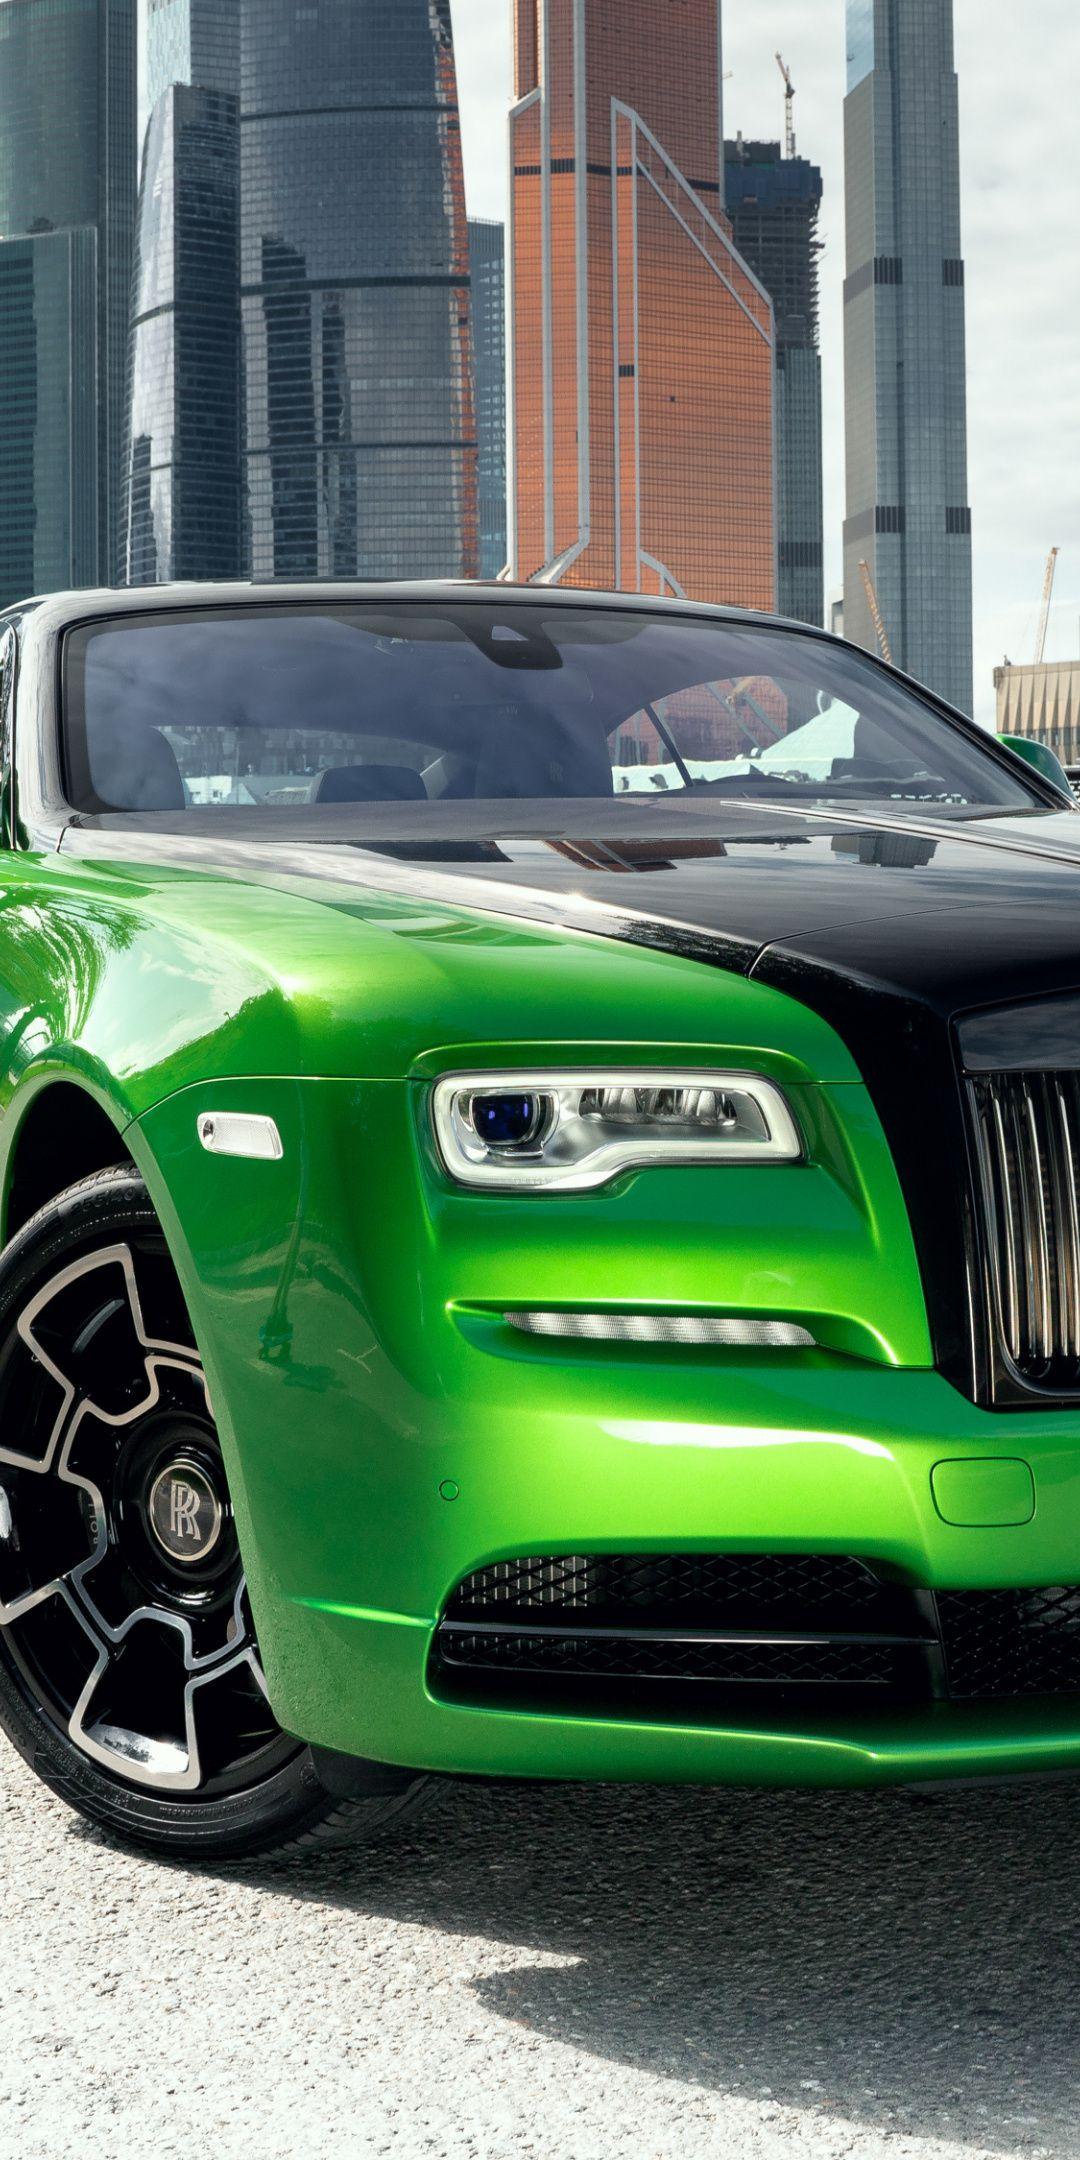 1080x2160 Rolls Royce Wraith Green Black Car 2019 Wallpaper Rolls Royce Wraith Luxury Cars Rolls Royce Rolls Royce [ 2160 x 1080 Pixel ]